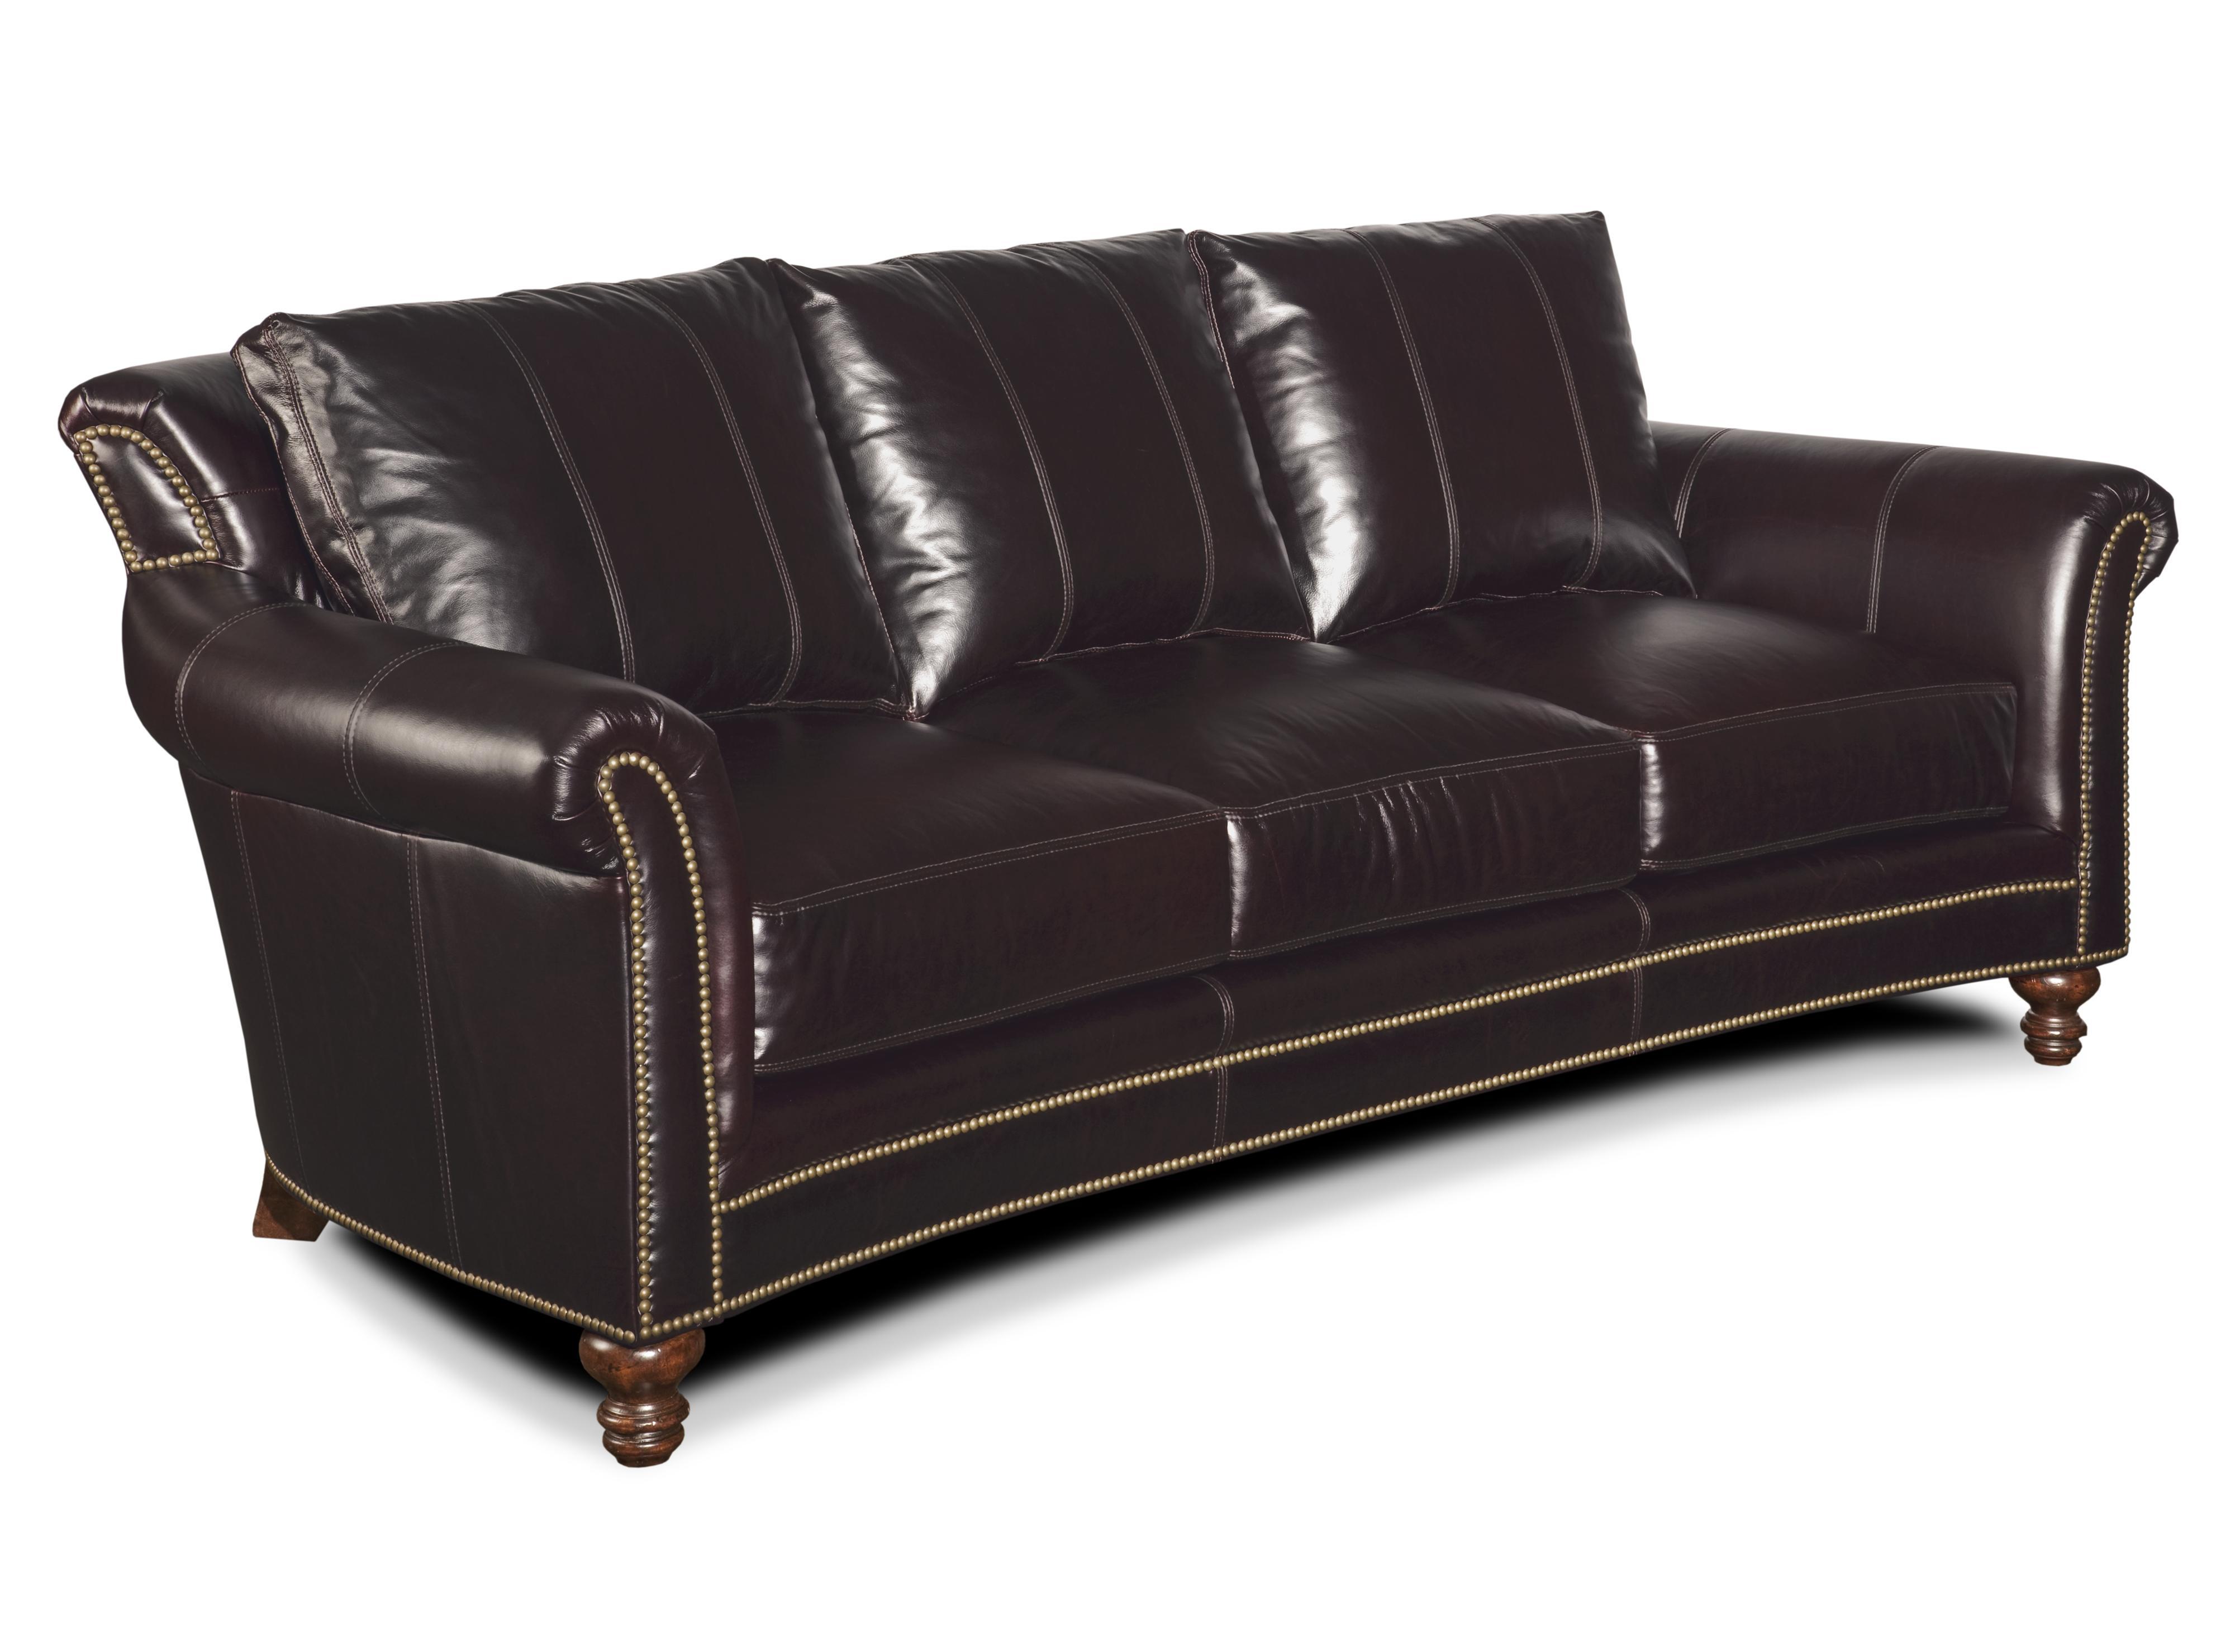 Richardson Richardson Stationary Sofa by Bradington Young at Baer's Furniture